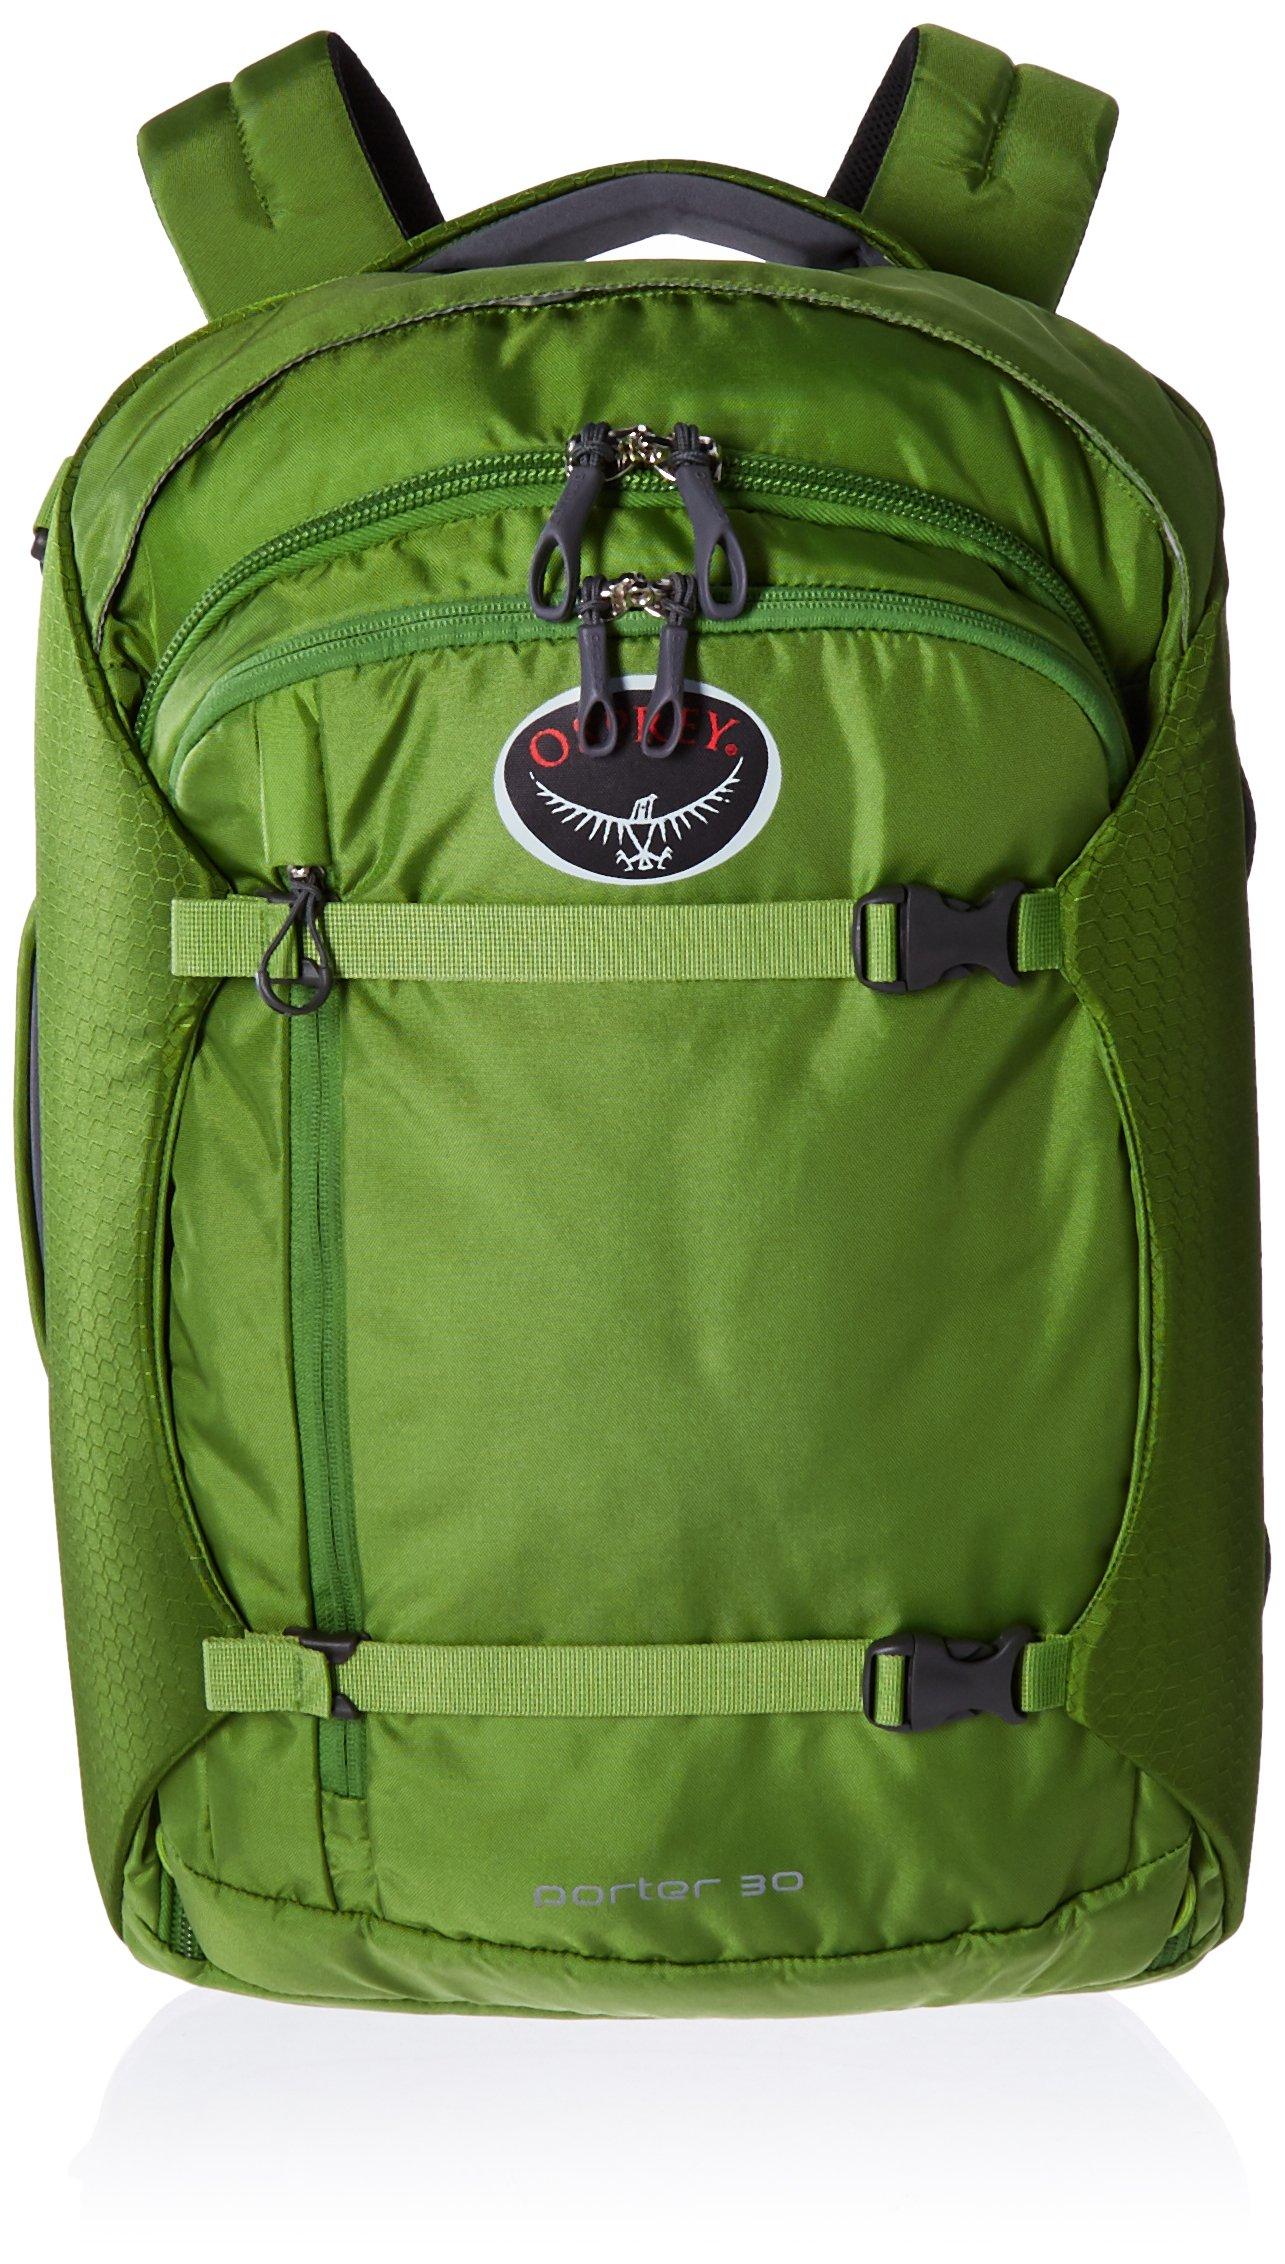 Osprey Porter Travel Duffel Bag, Nitro Green, 30-Liter